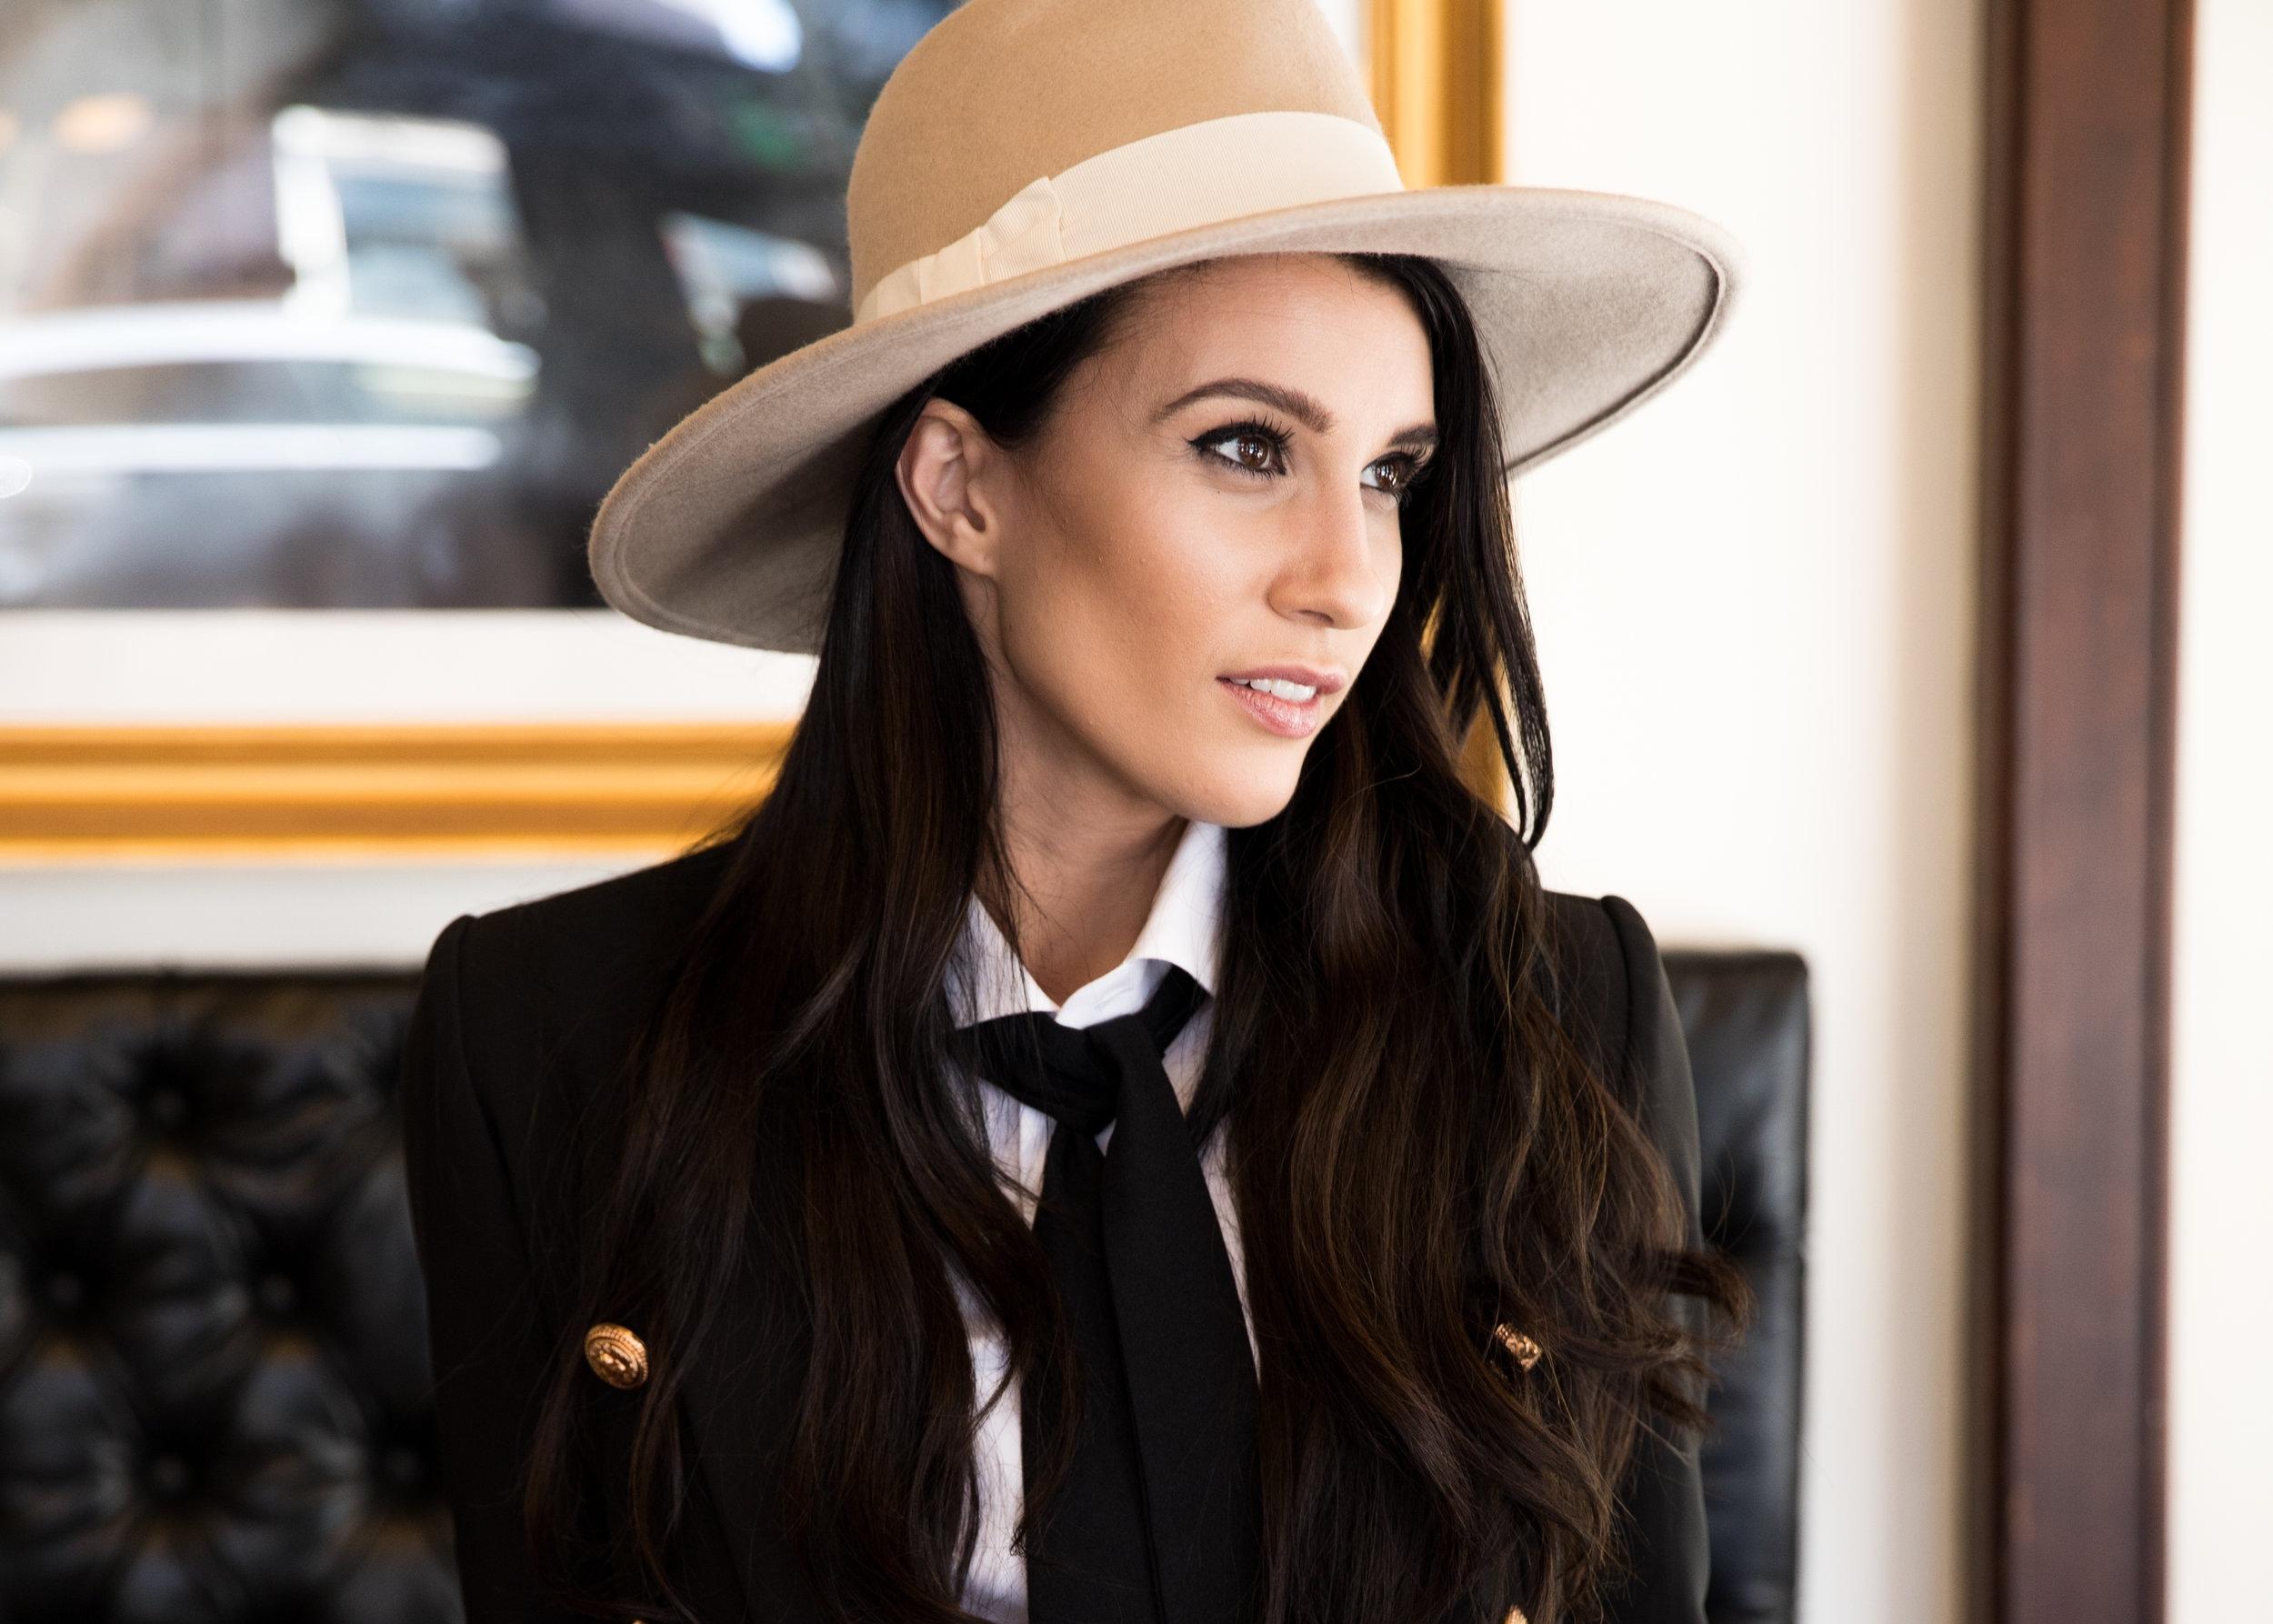 <h2>Elise Gabriel, Paradox Beauty</h2>